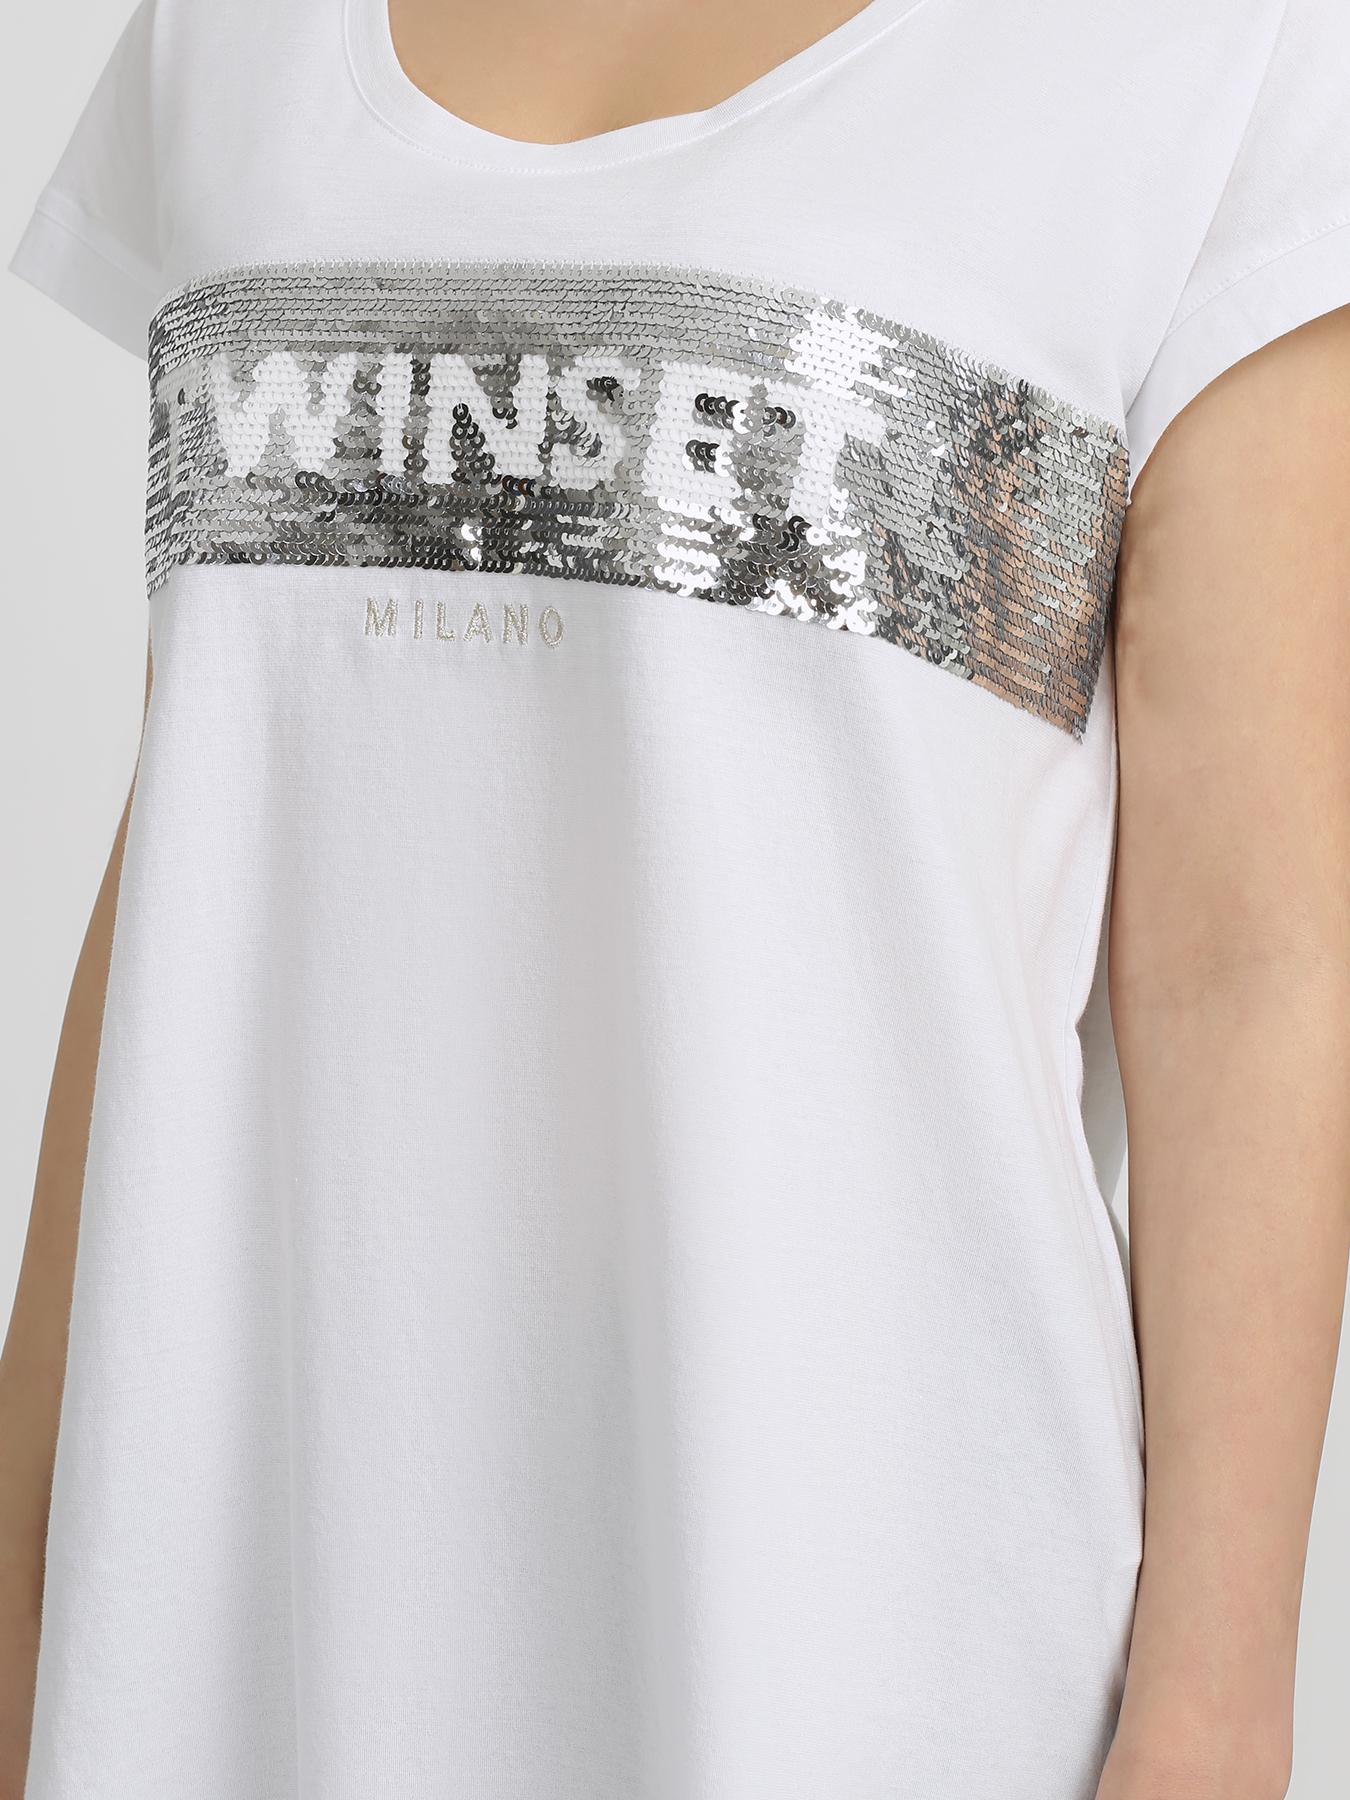 TWINSET MILANO Хлопковая футболка 333255-043 Фото 3